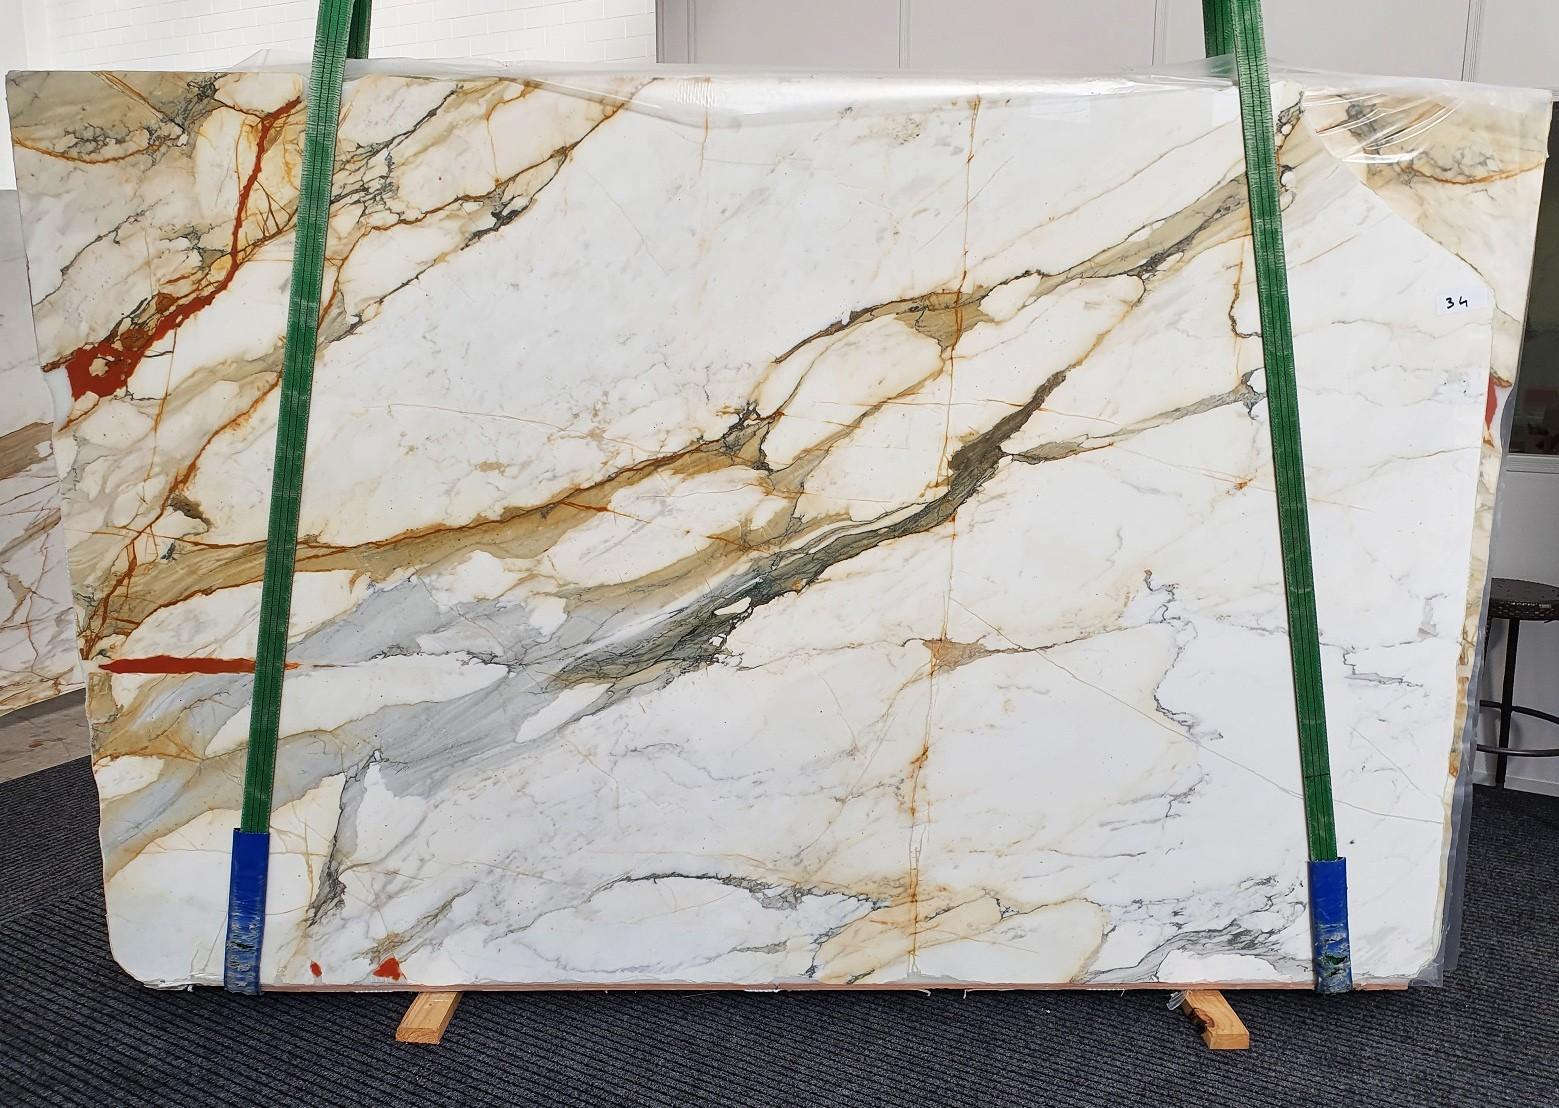 CALACATTA MACCHIAVECCHIA polierte Unmaßplatten 1422 aus Natur Marmor , Slab #34: Lieferung Veneto, Italien